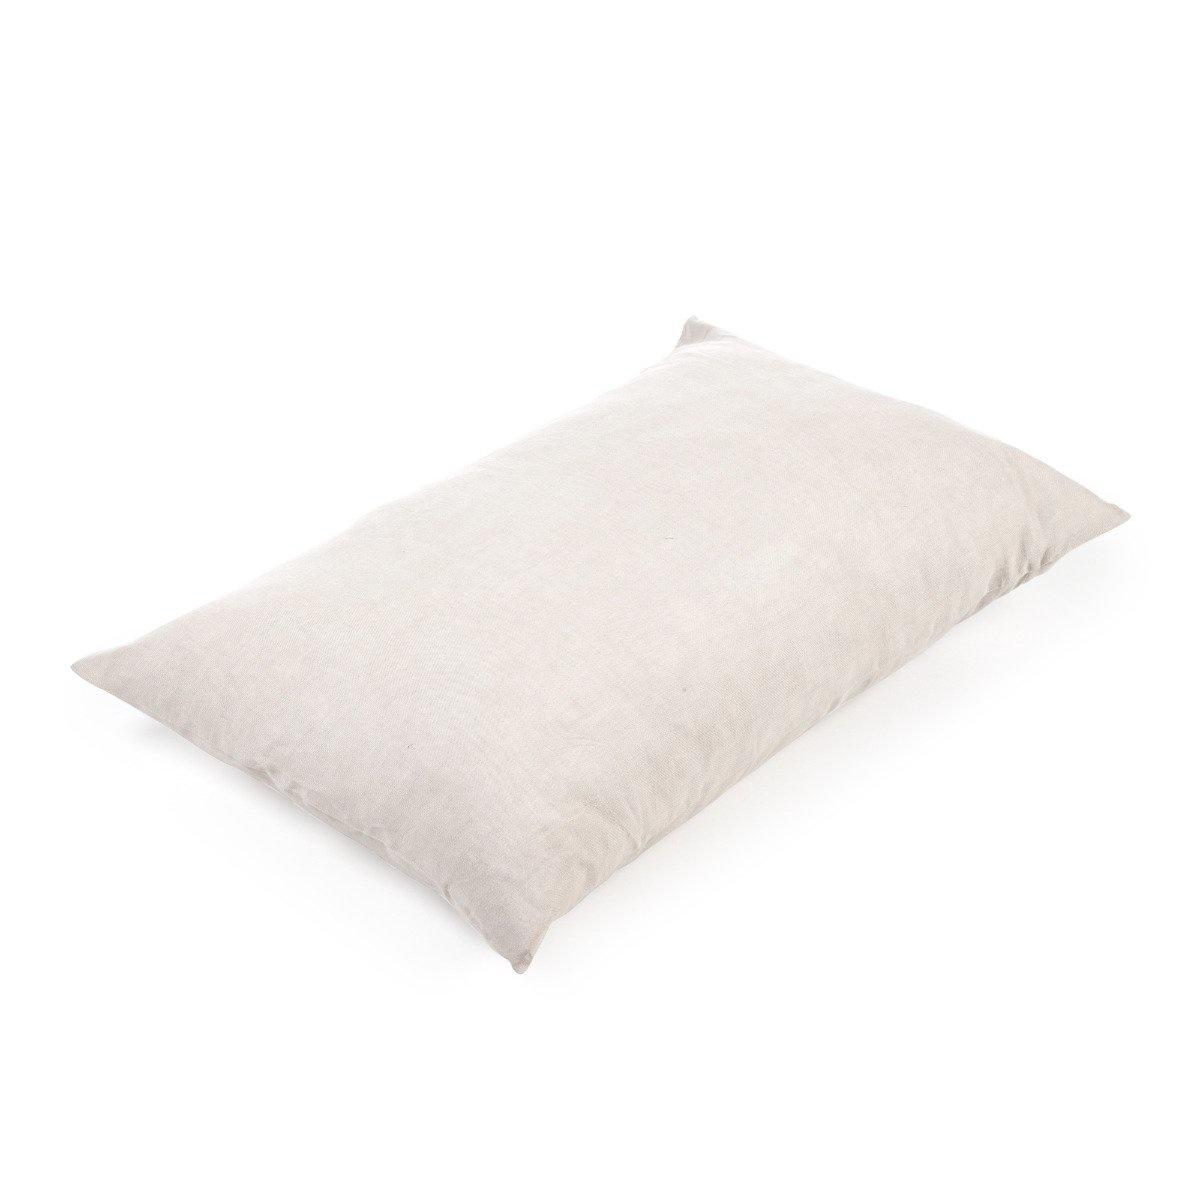 Pillow Sham - Santiago - Asst Colours-6